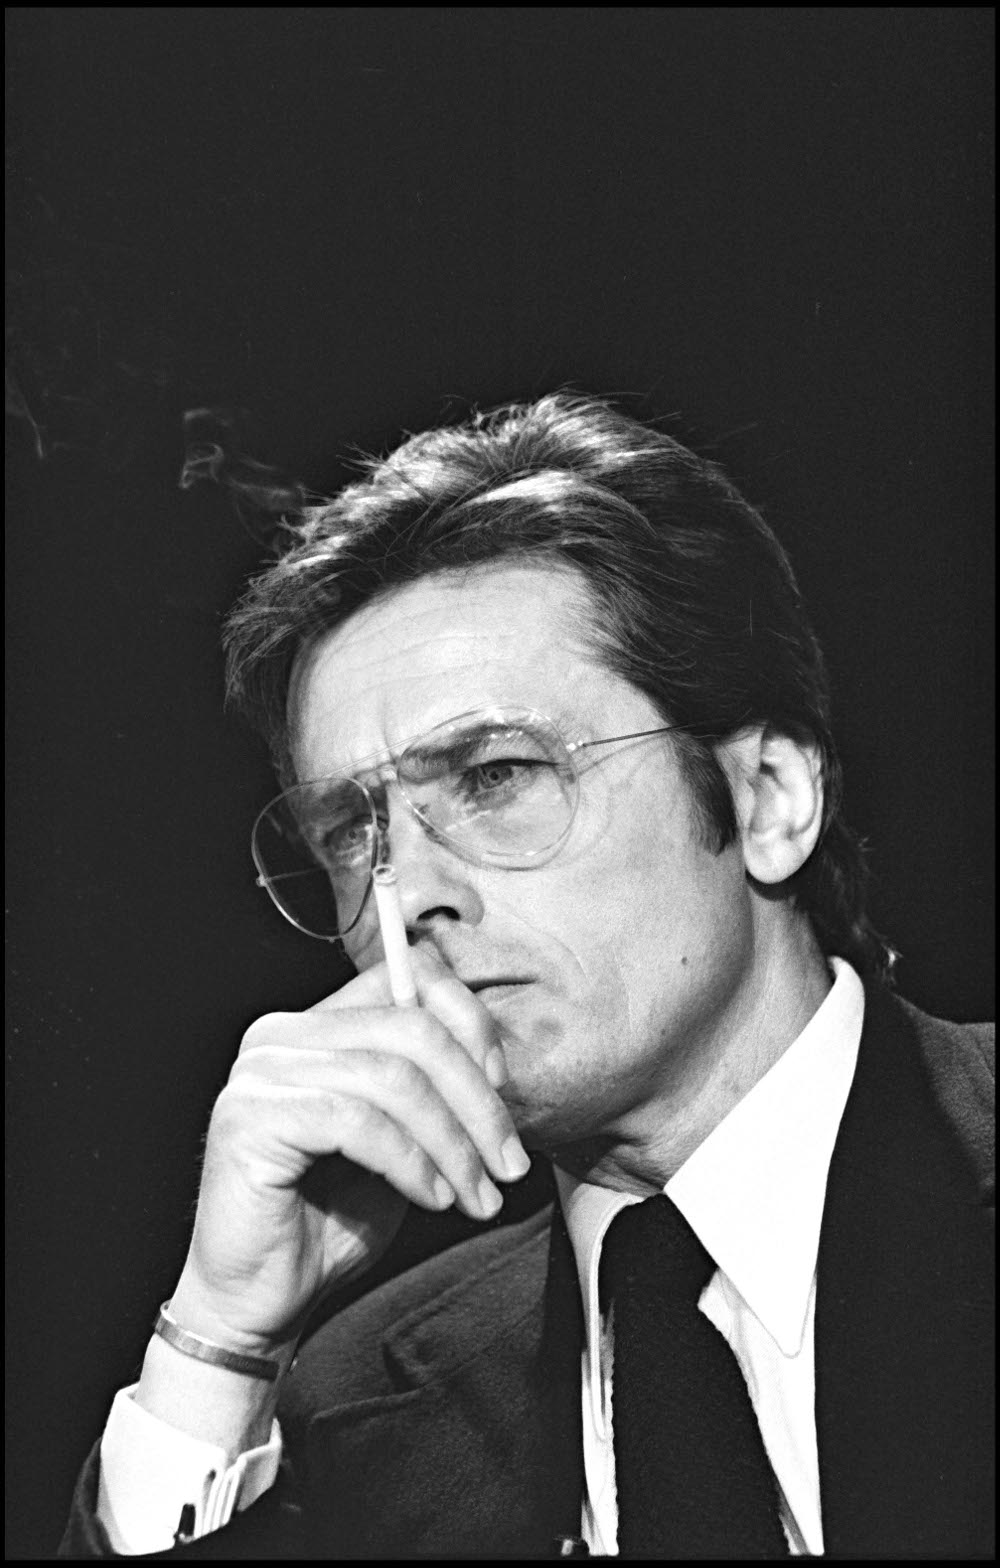 Alain-Delon-cigar Αλαίν Ντελόν: Ο πολυαγαπημένος γόης όλων των γυναικών